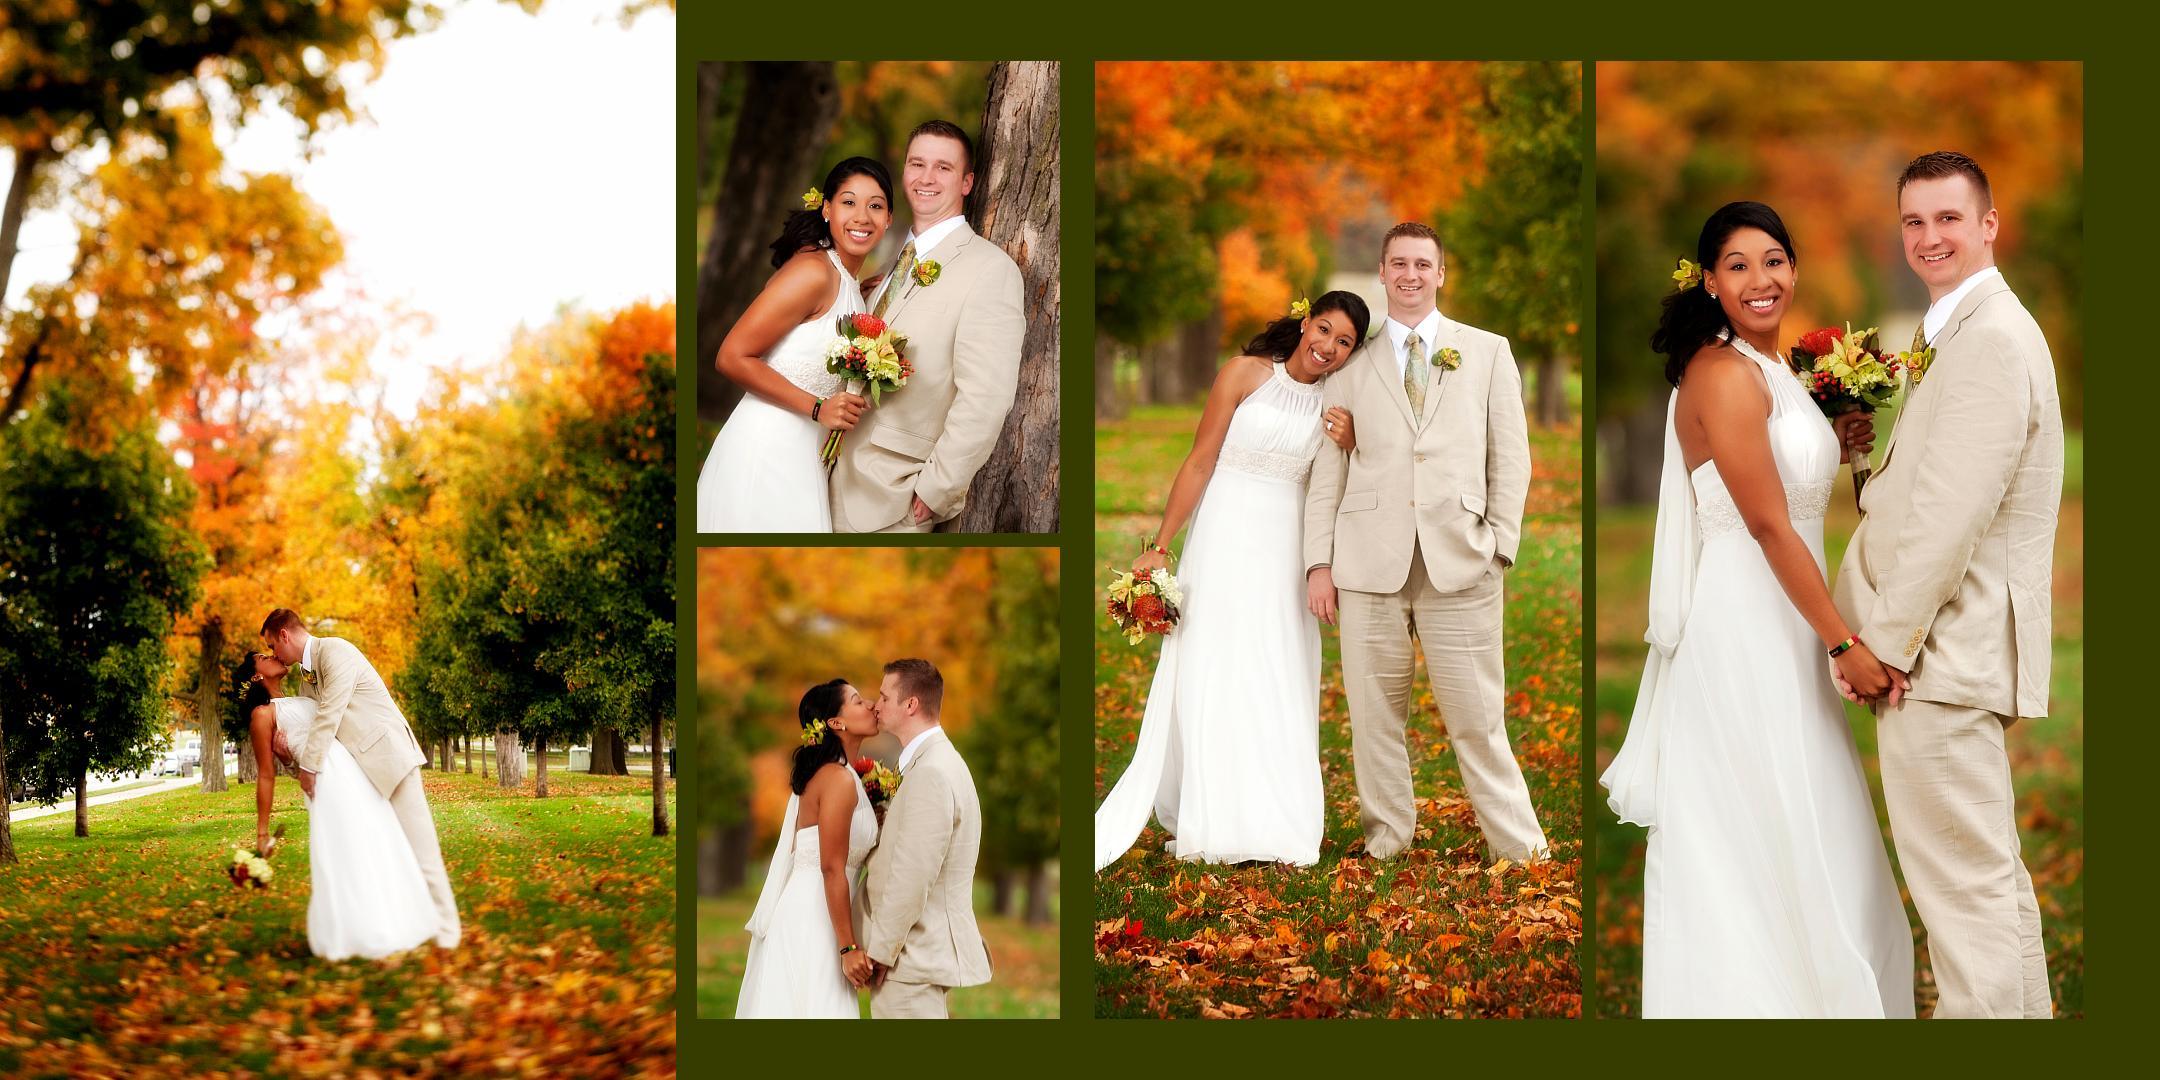 Wedding Photos by Tom Schmidt Chicago (31)